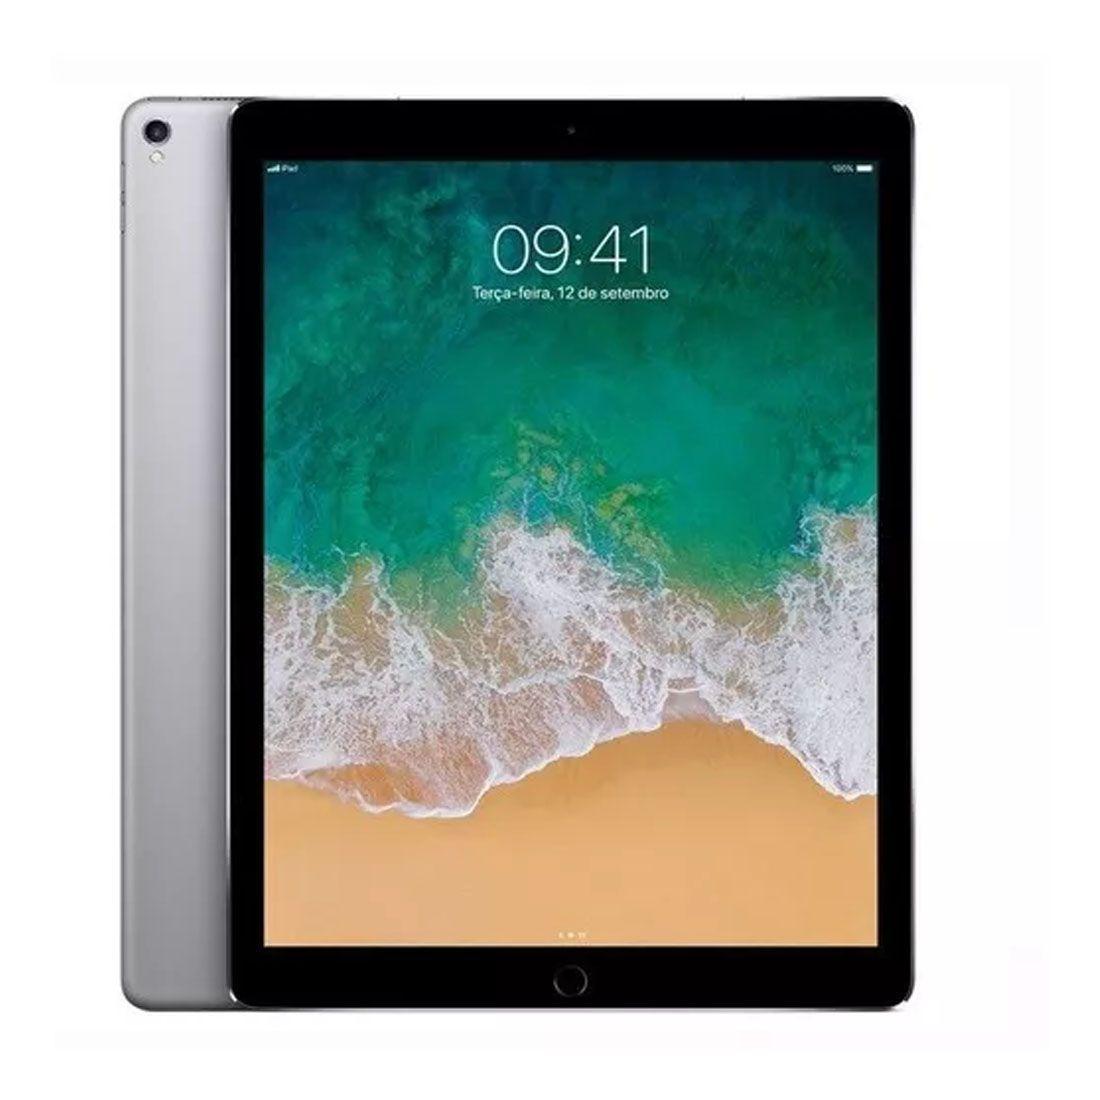 iPad Pro Apple, Tela Retina 12,9', 256GB, Space Gray - Wifi - MP6G2LL/A